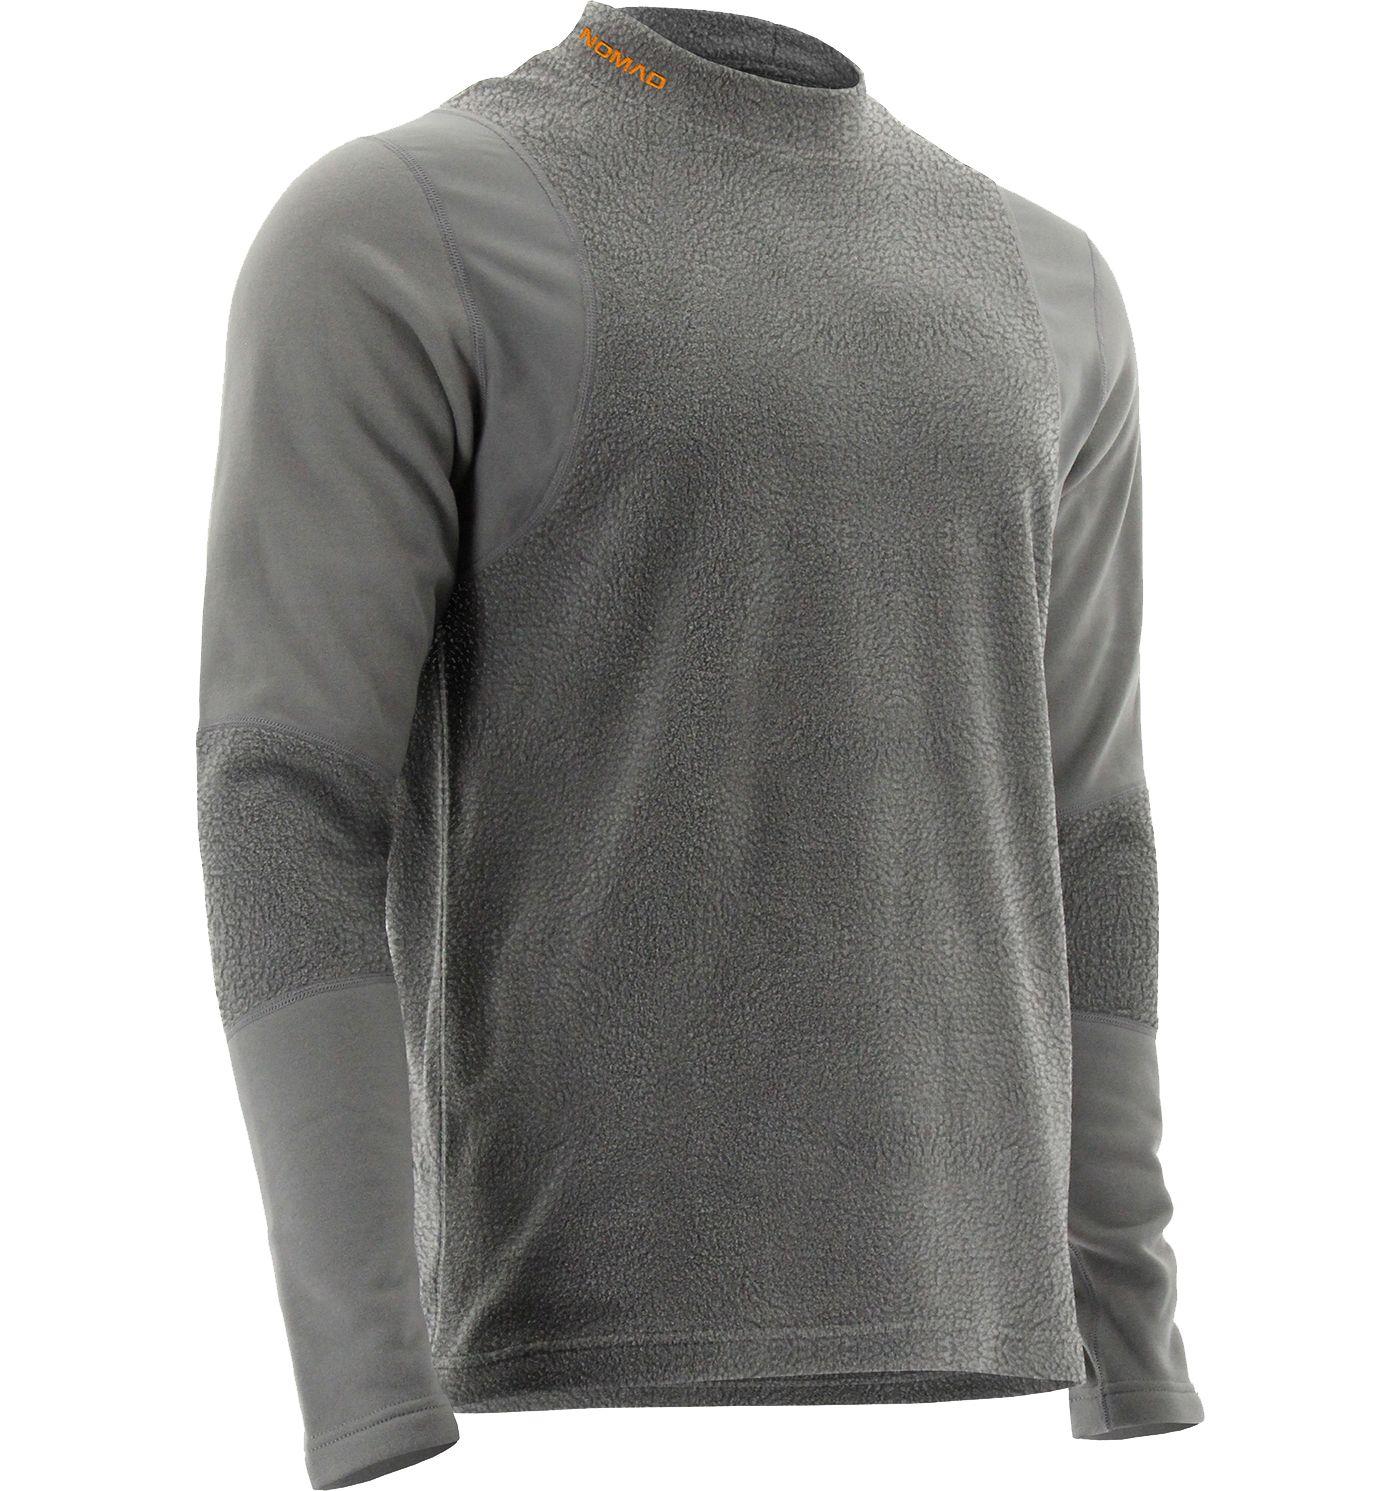 NOMAD Men's Cottonwood Baselayer Crewneck Shirt